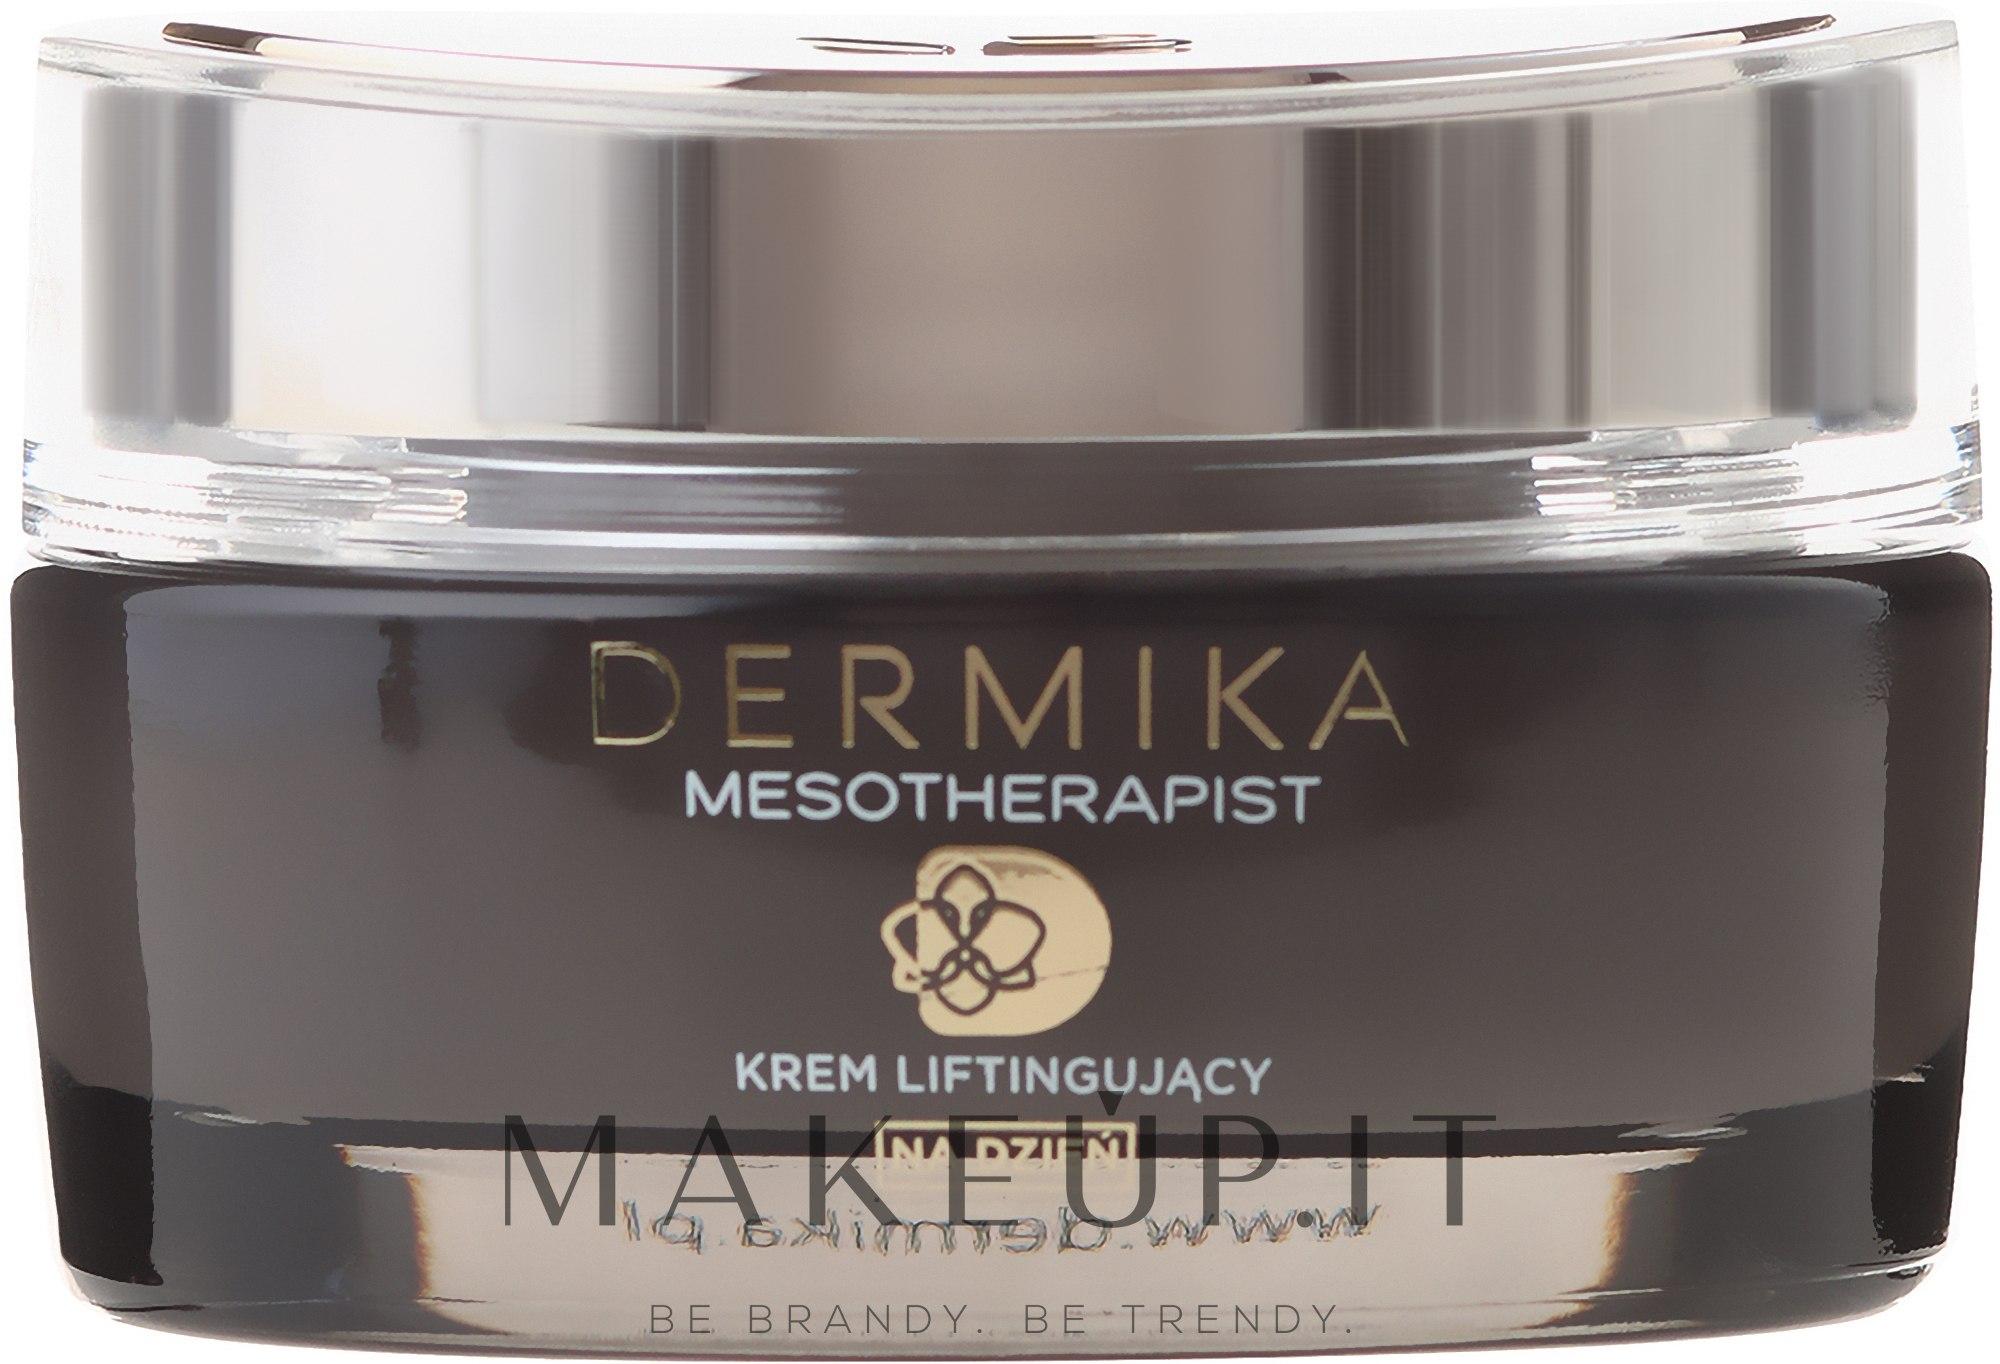 Crema lifting viso - Dermika Mesotherapist Lifting Cream — foto 50 ml